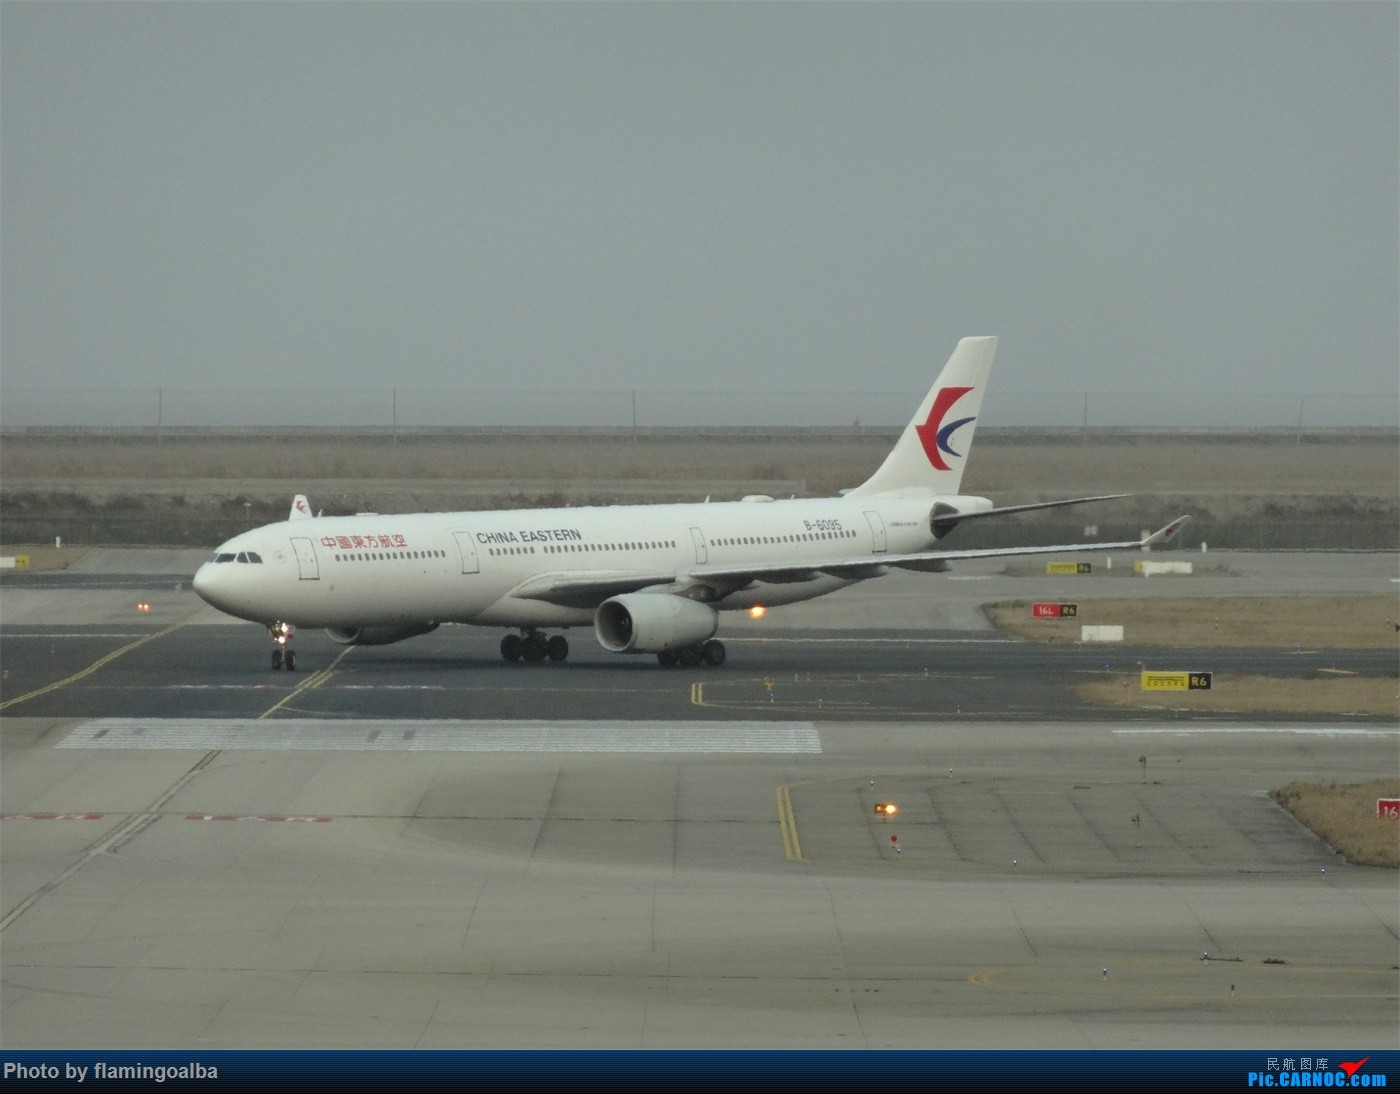 Re:[原创]浦东-达拉斯-纽瓦克-华盛顿里根-拉斯维加斯-洛杉矶-达拉斯-浦东 AIRBUS A330-300 B-6095 中国上海浦东国际机场